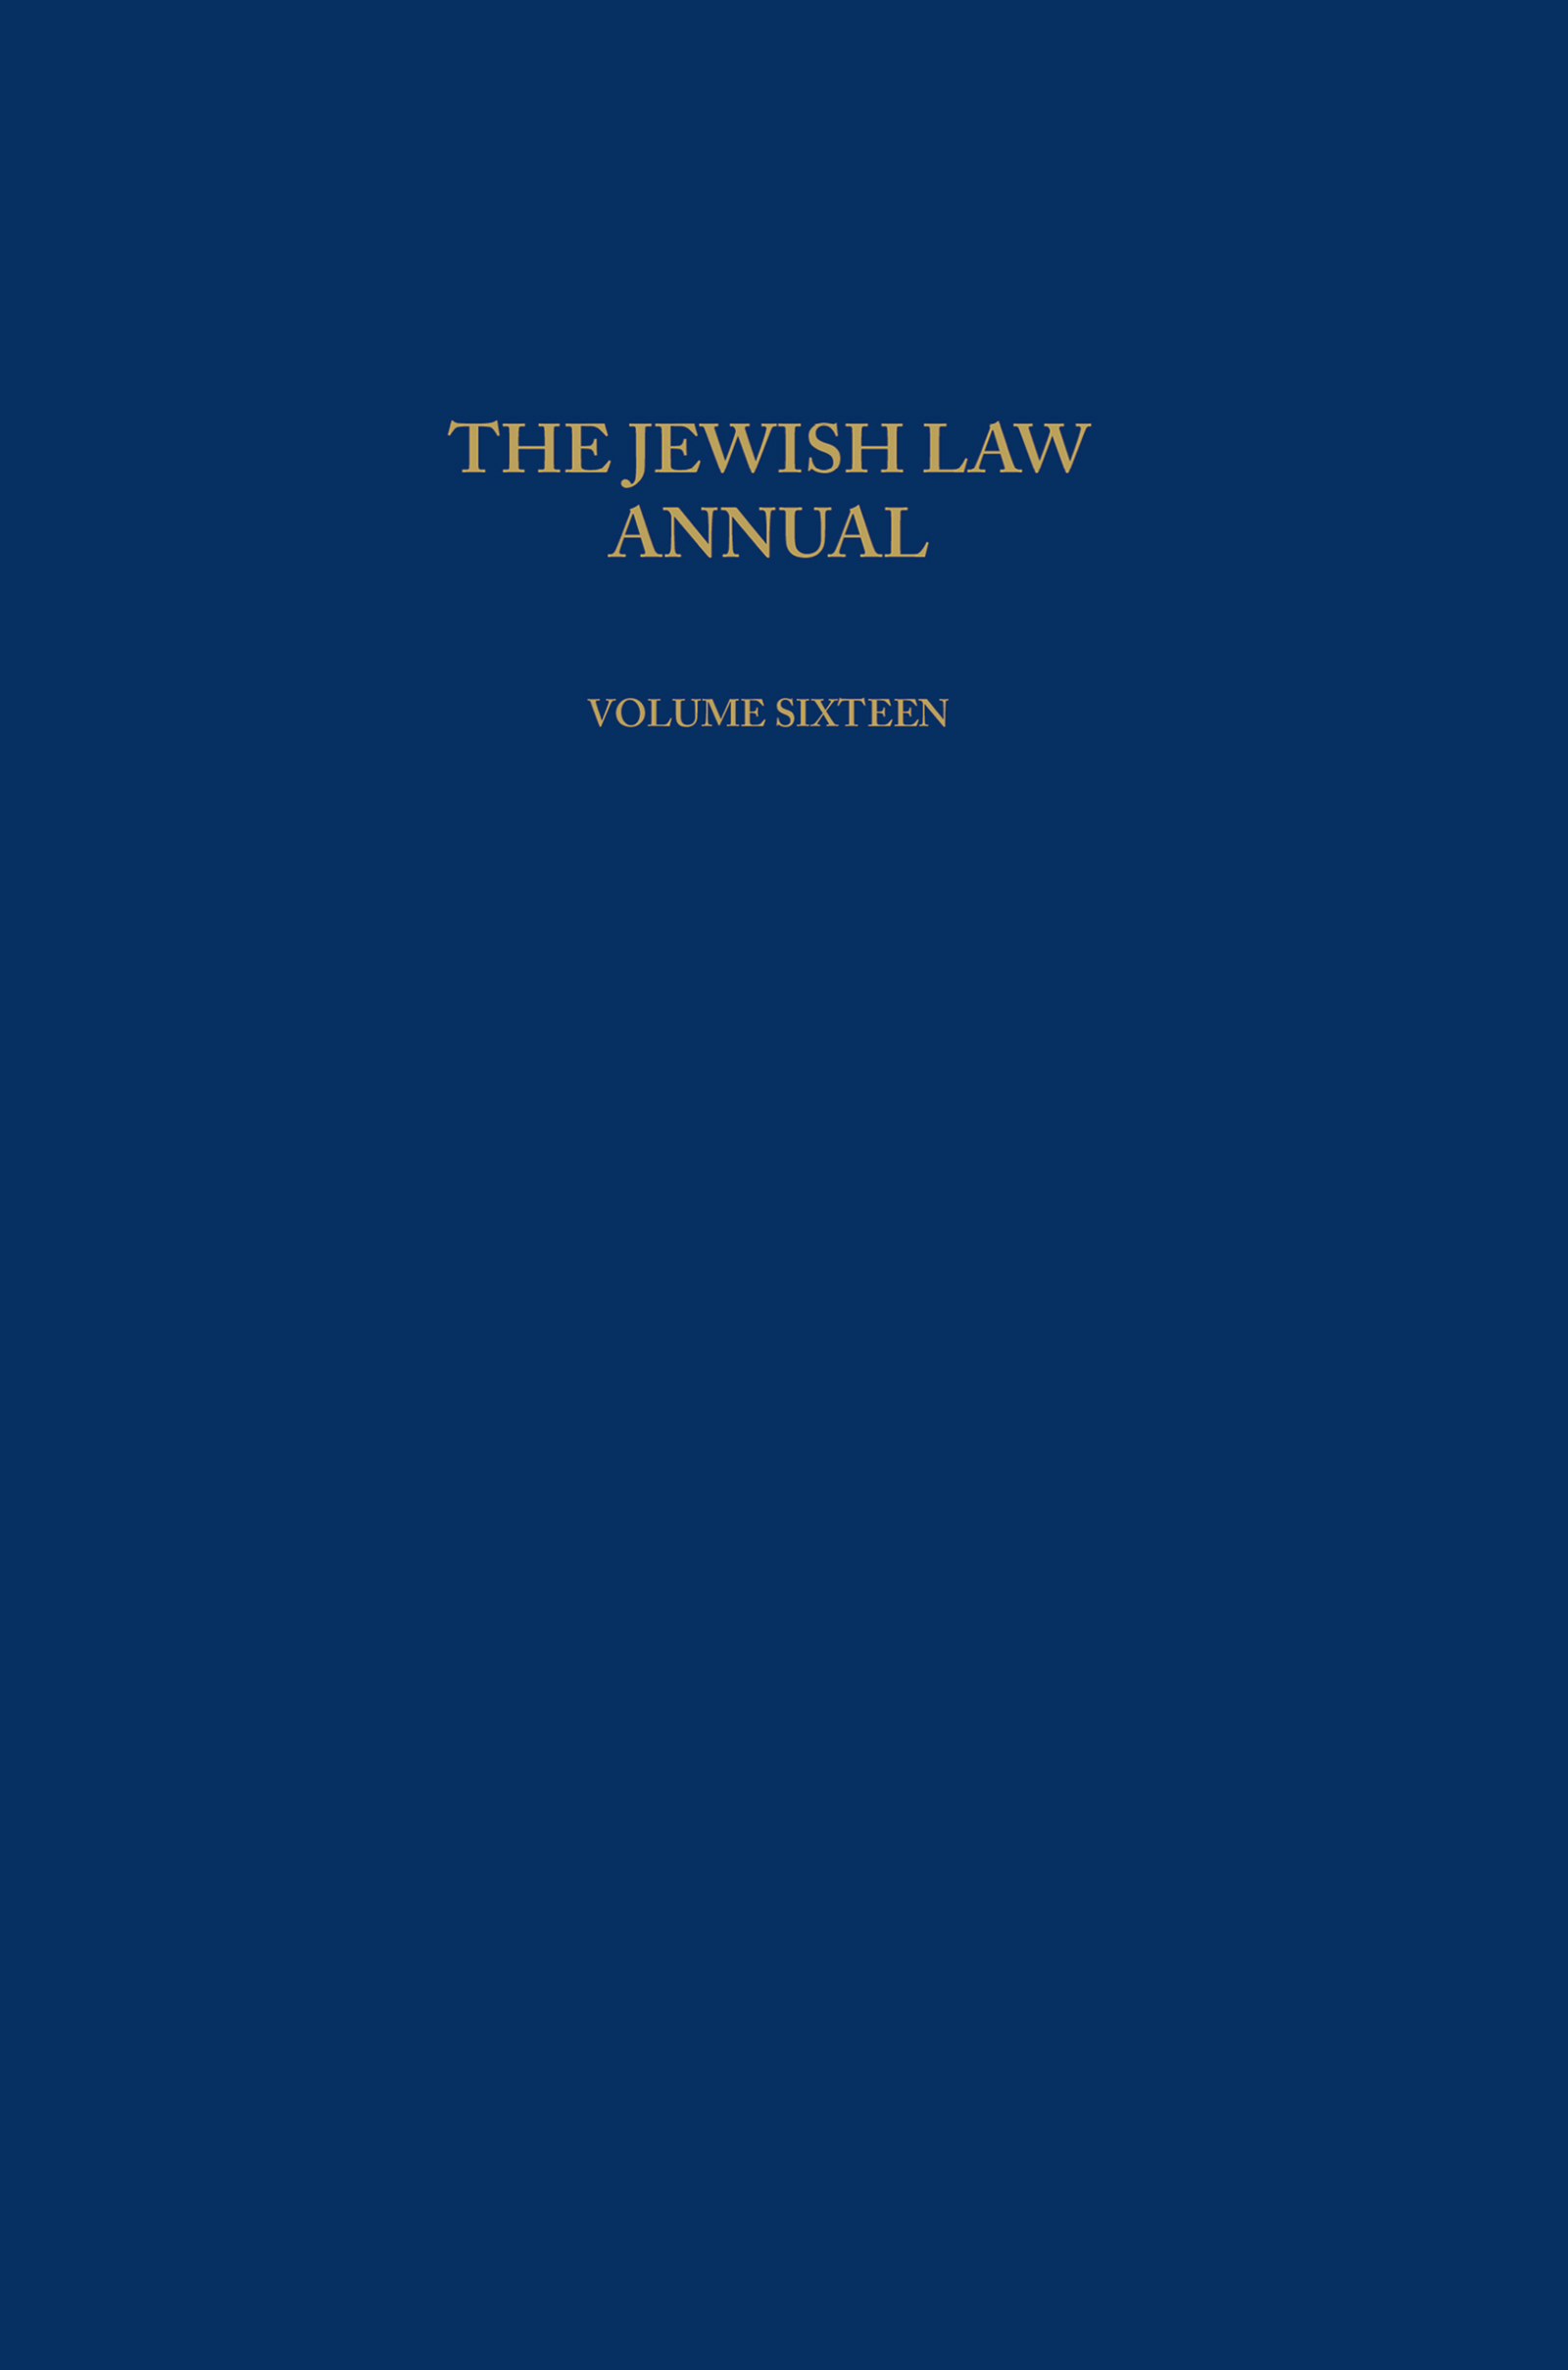 The Jewish Law Annual Volume 16